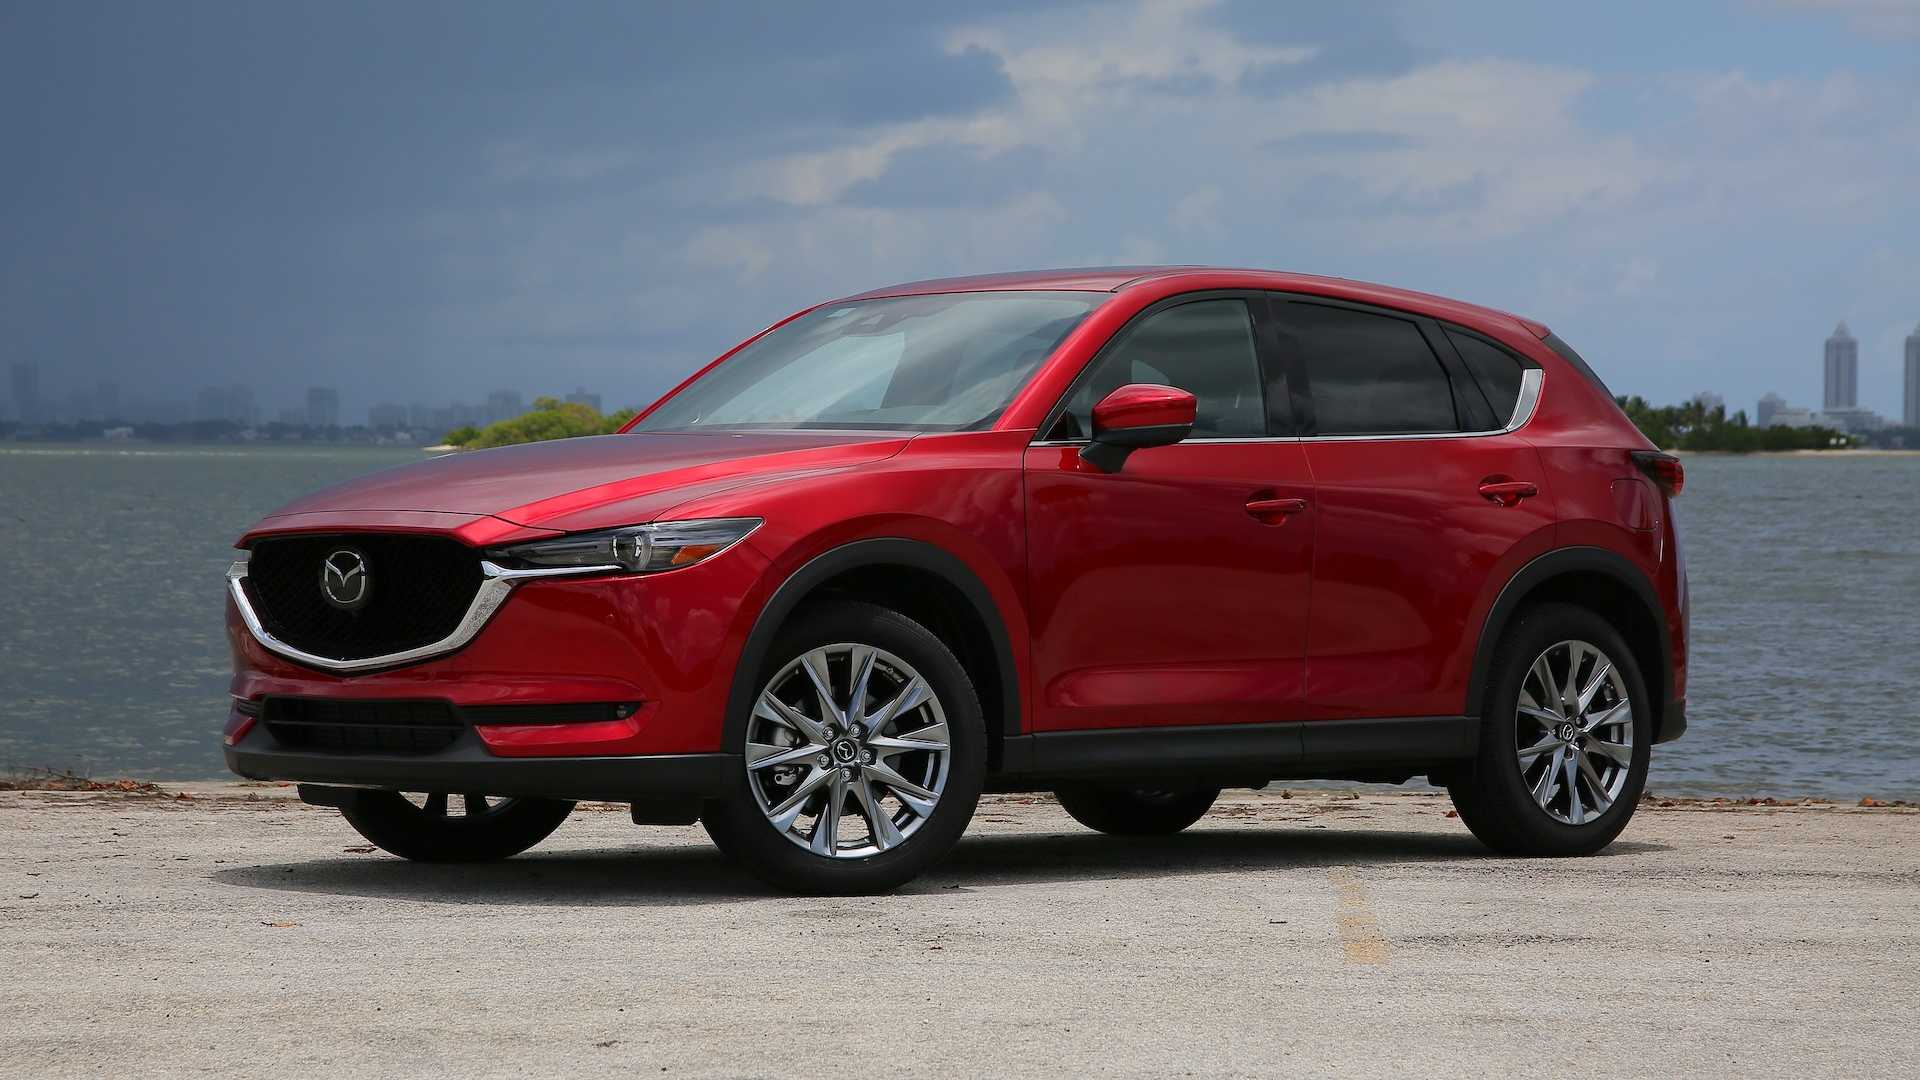 Kekurangan Mazda Cx 5 2019 Perbandingan Harga